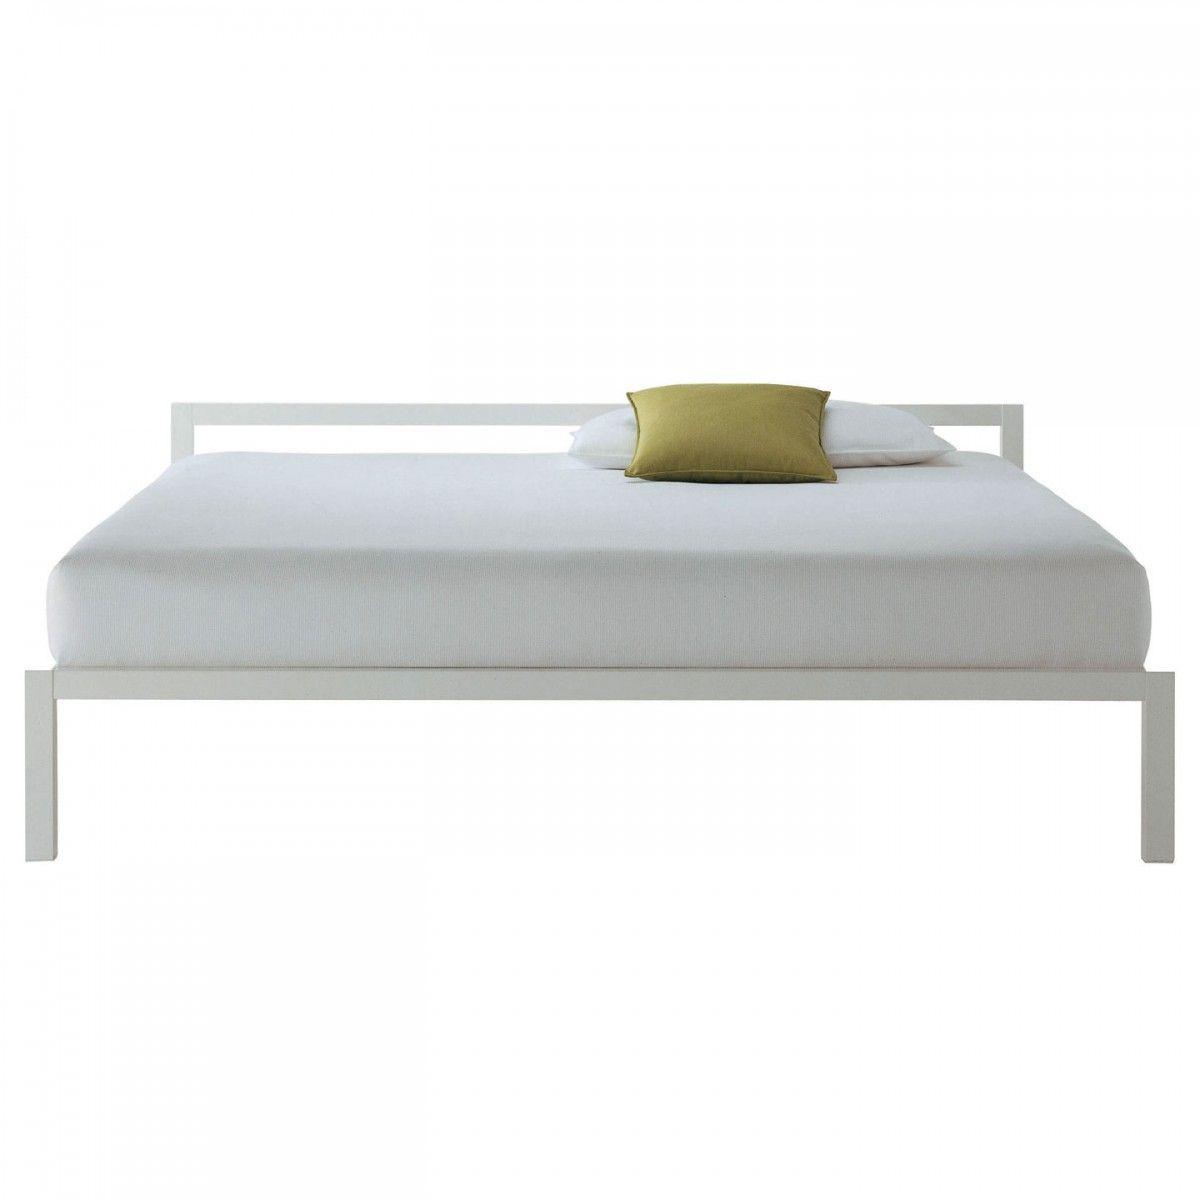 Aluminium Bed Frame Kingsize Maison Chambre